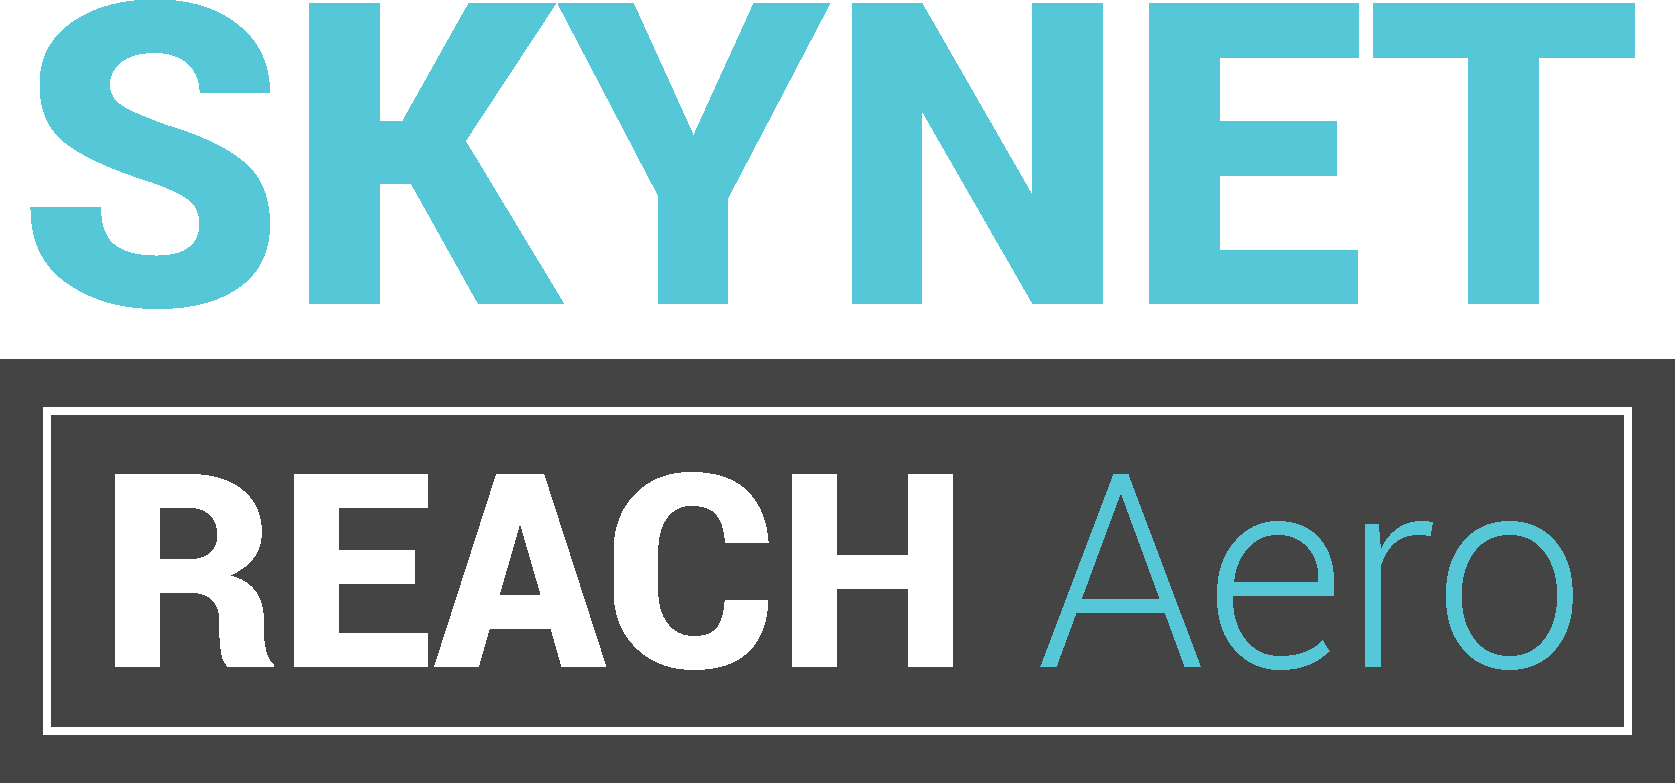 SkyNet REACH Aero